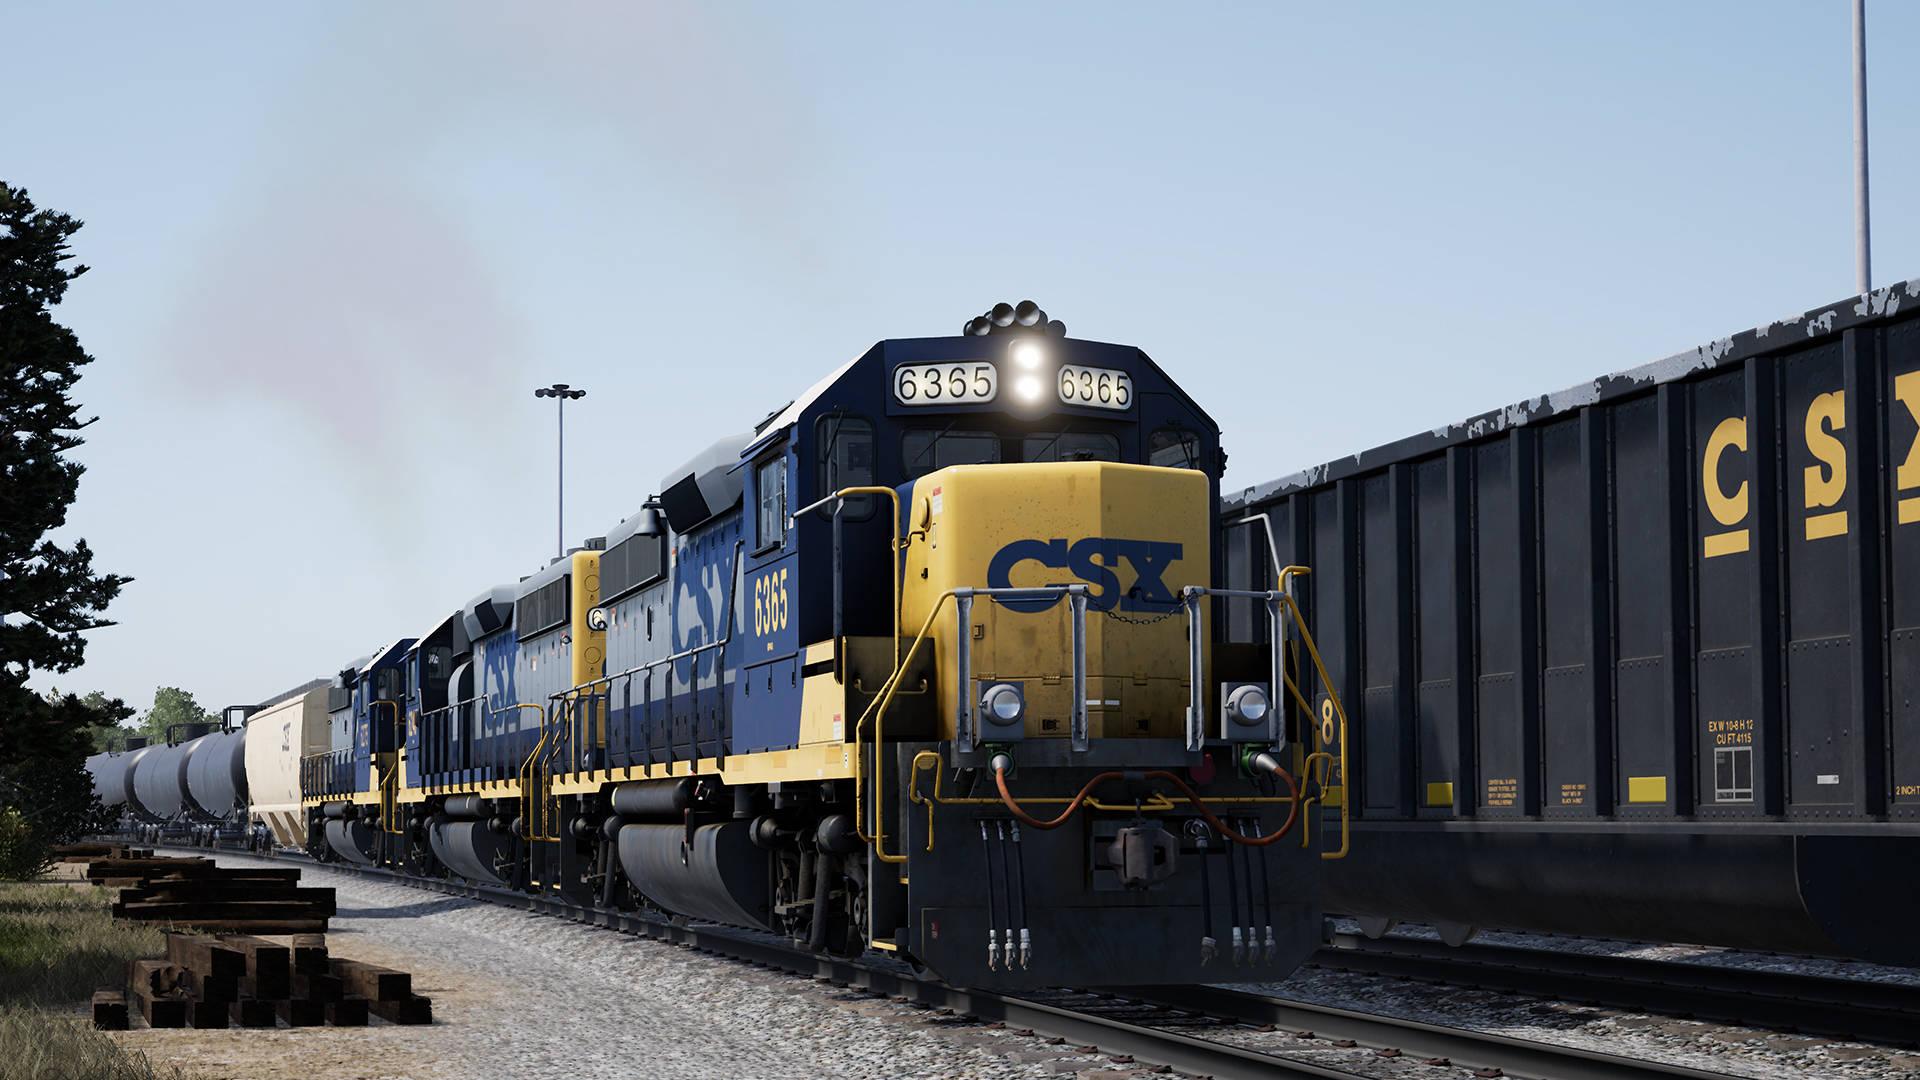 Just Trains - Train Sim World: CSX GP40-2 Loco Add-On